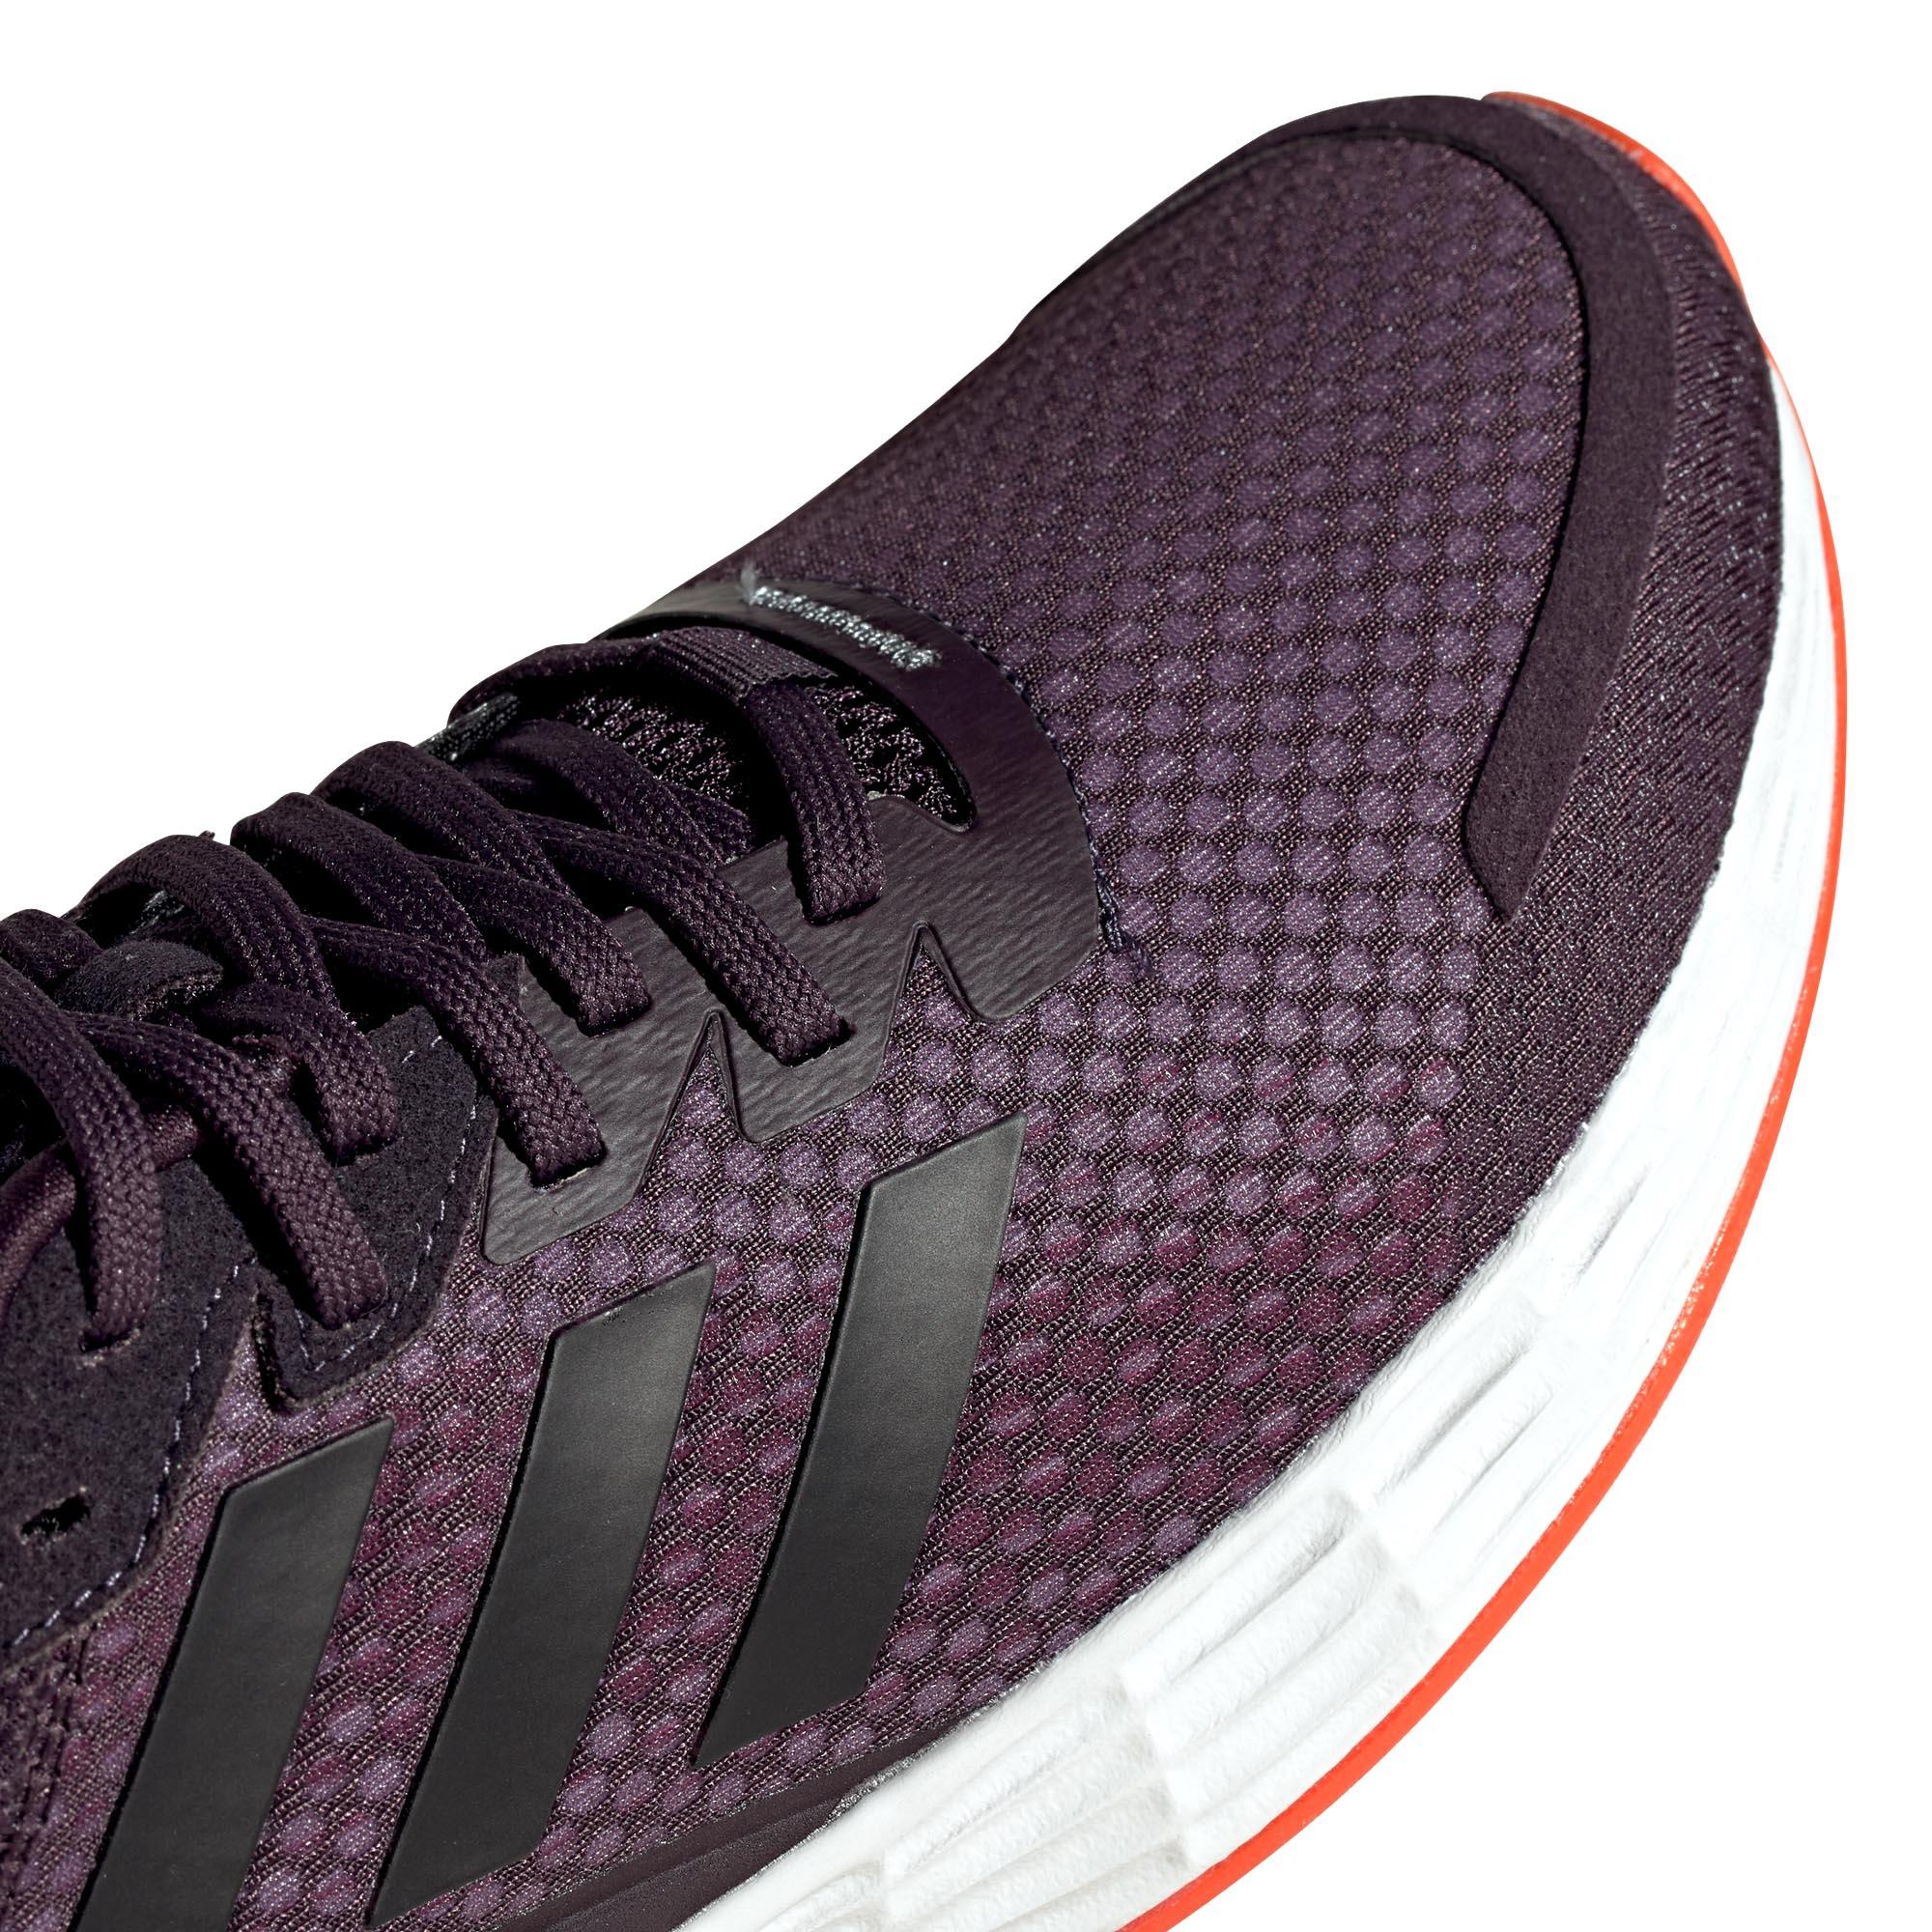 miniature 9 - Adidas Duramo SL Femme Running Fitness Sneaker Chaussure Violet/Noir/Blanc